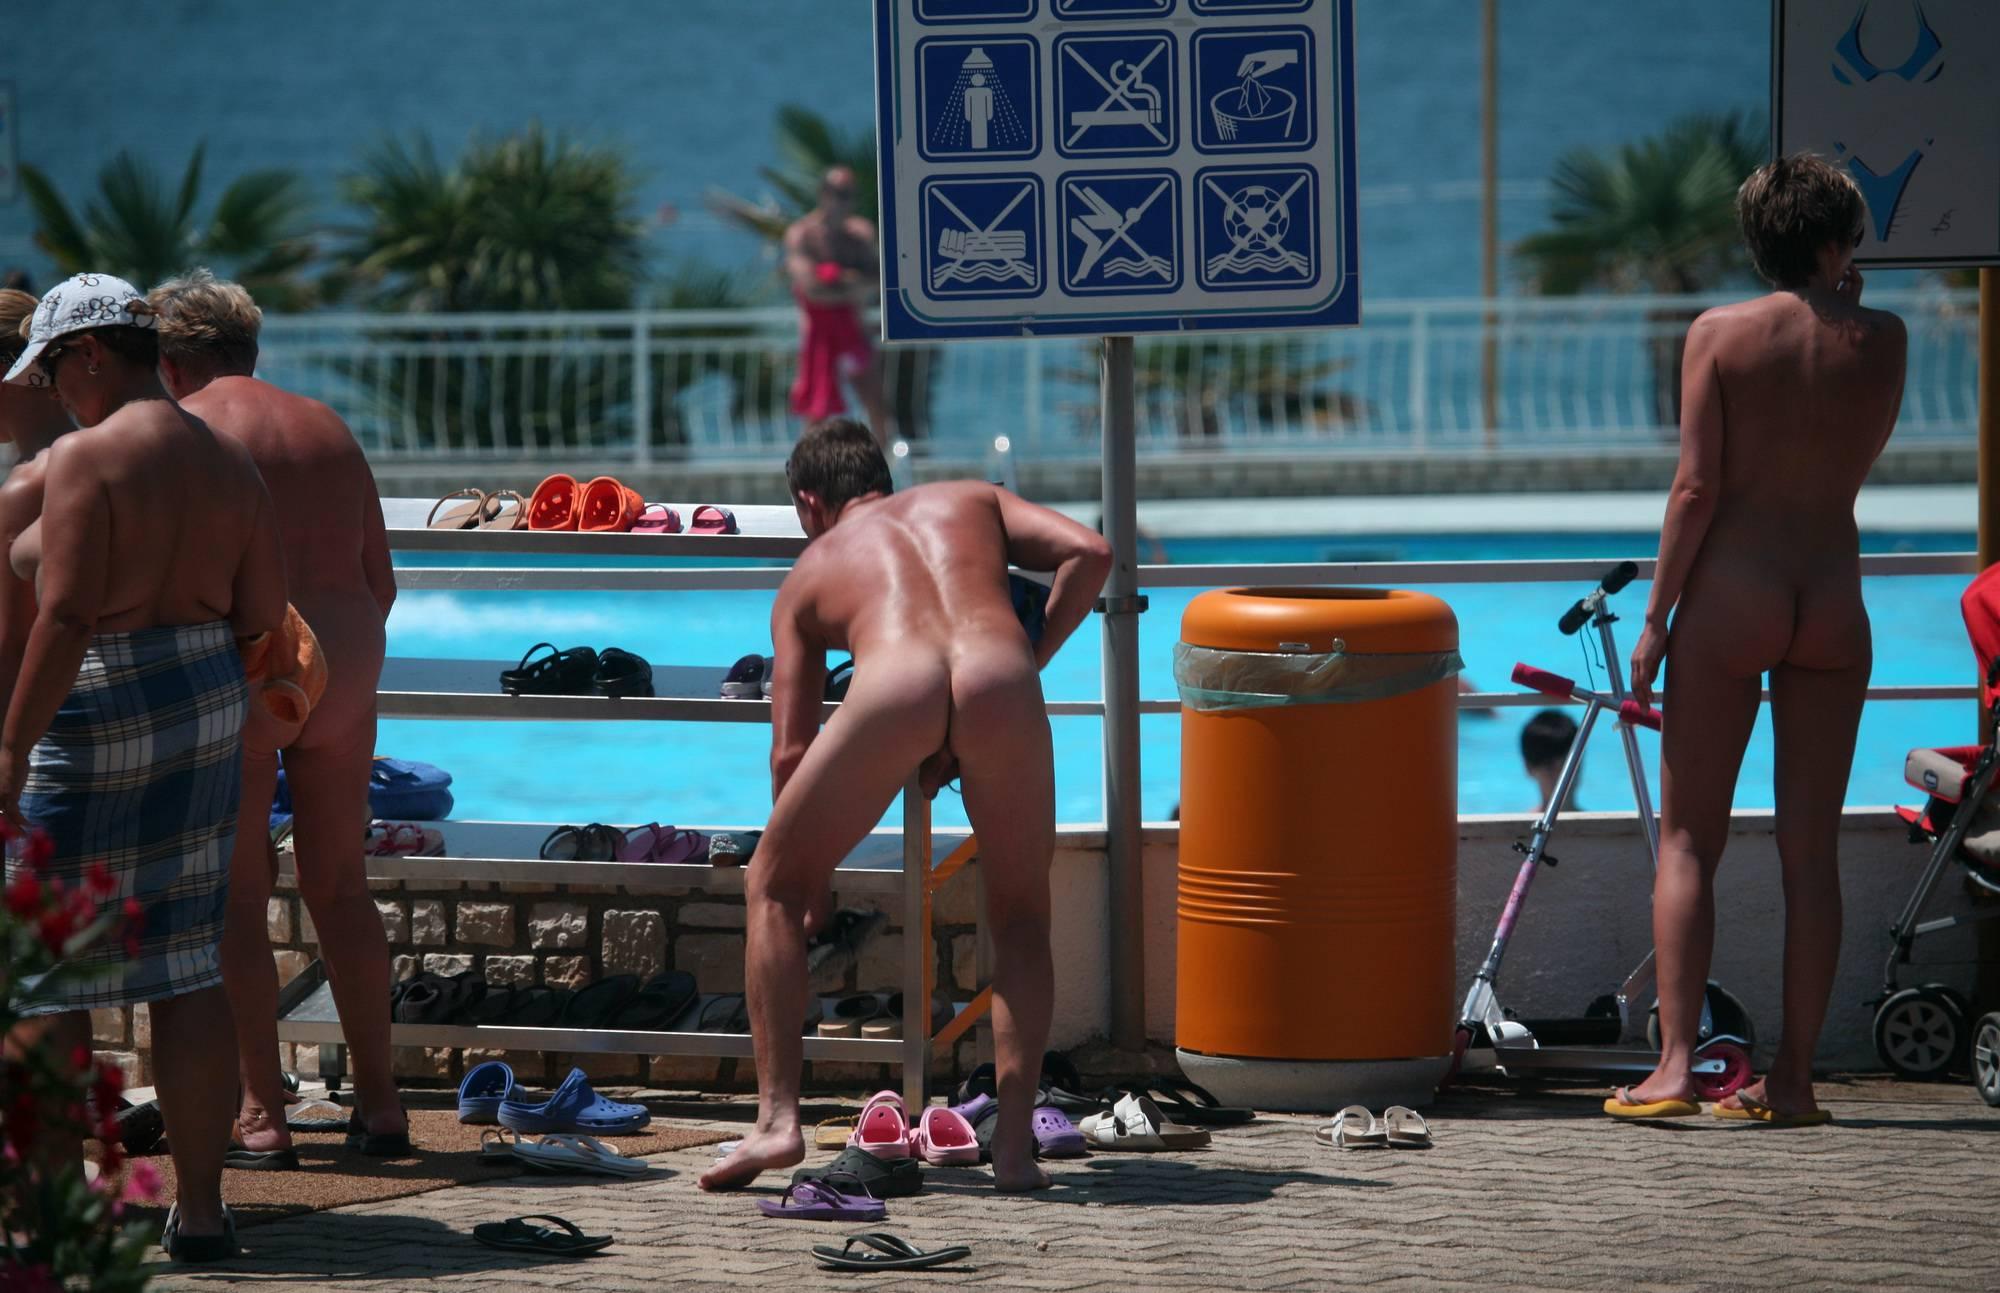 Nudist Pics Outdoor Pool Sideliners - 1